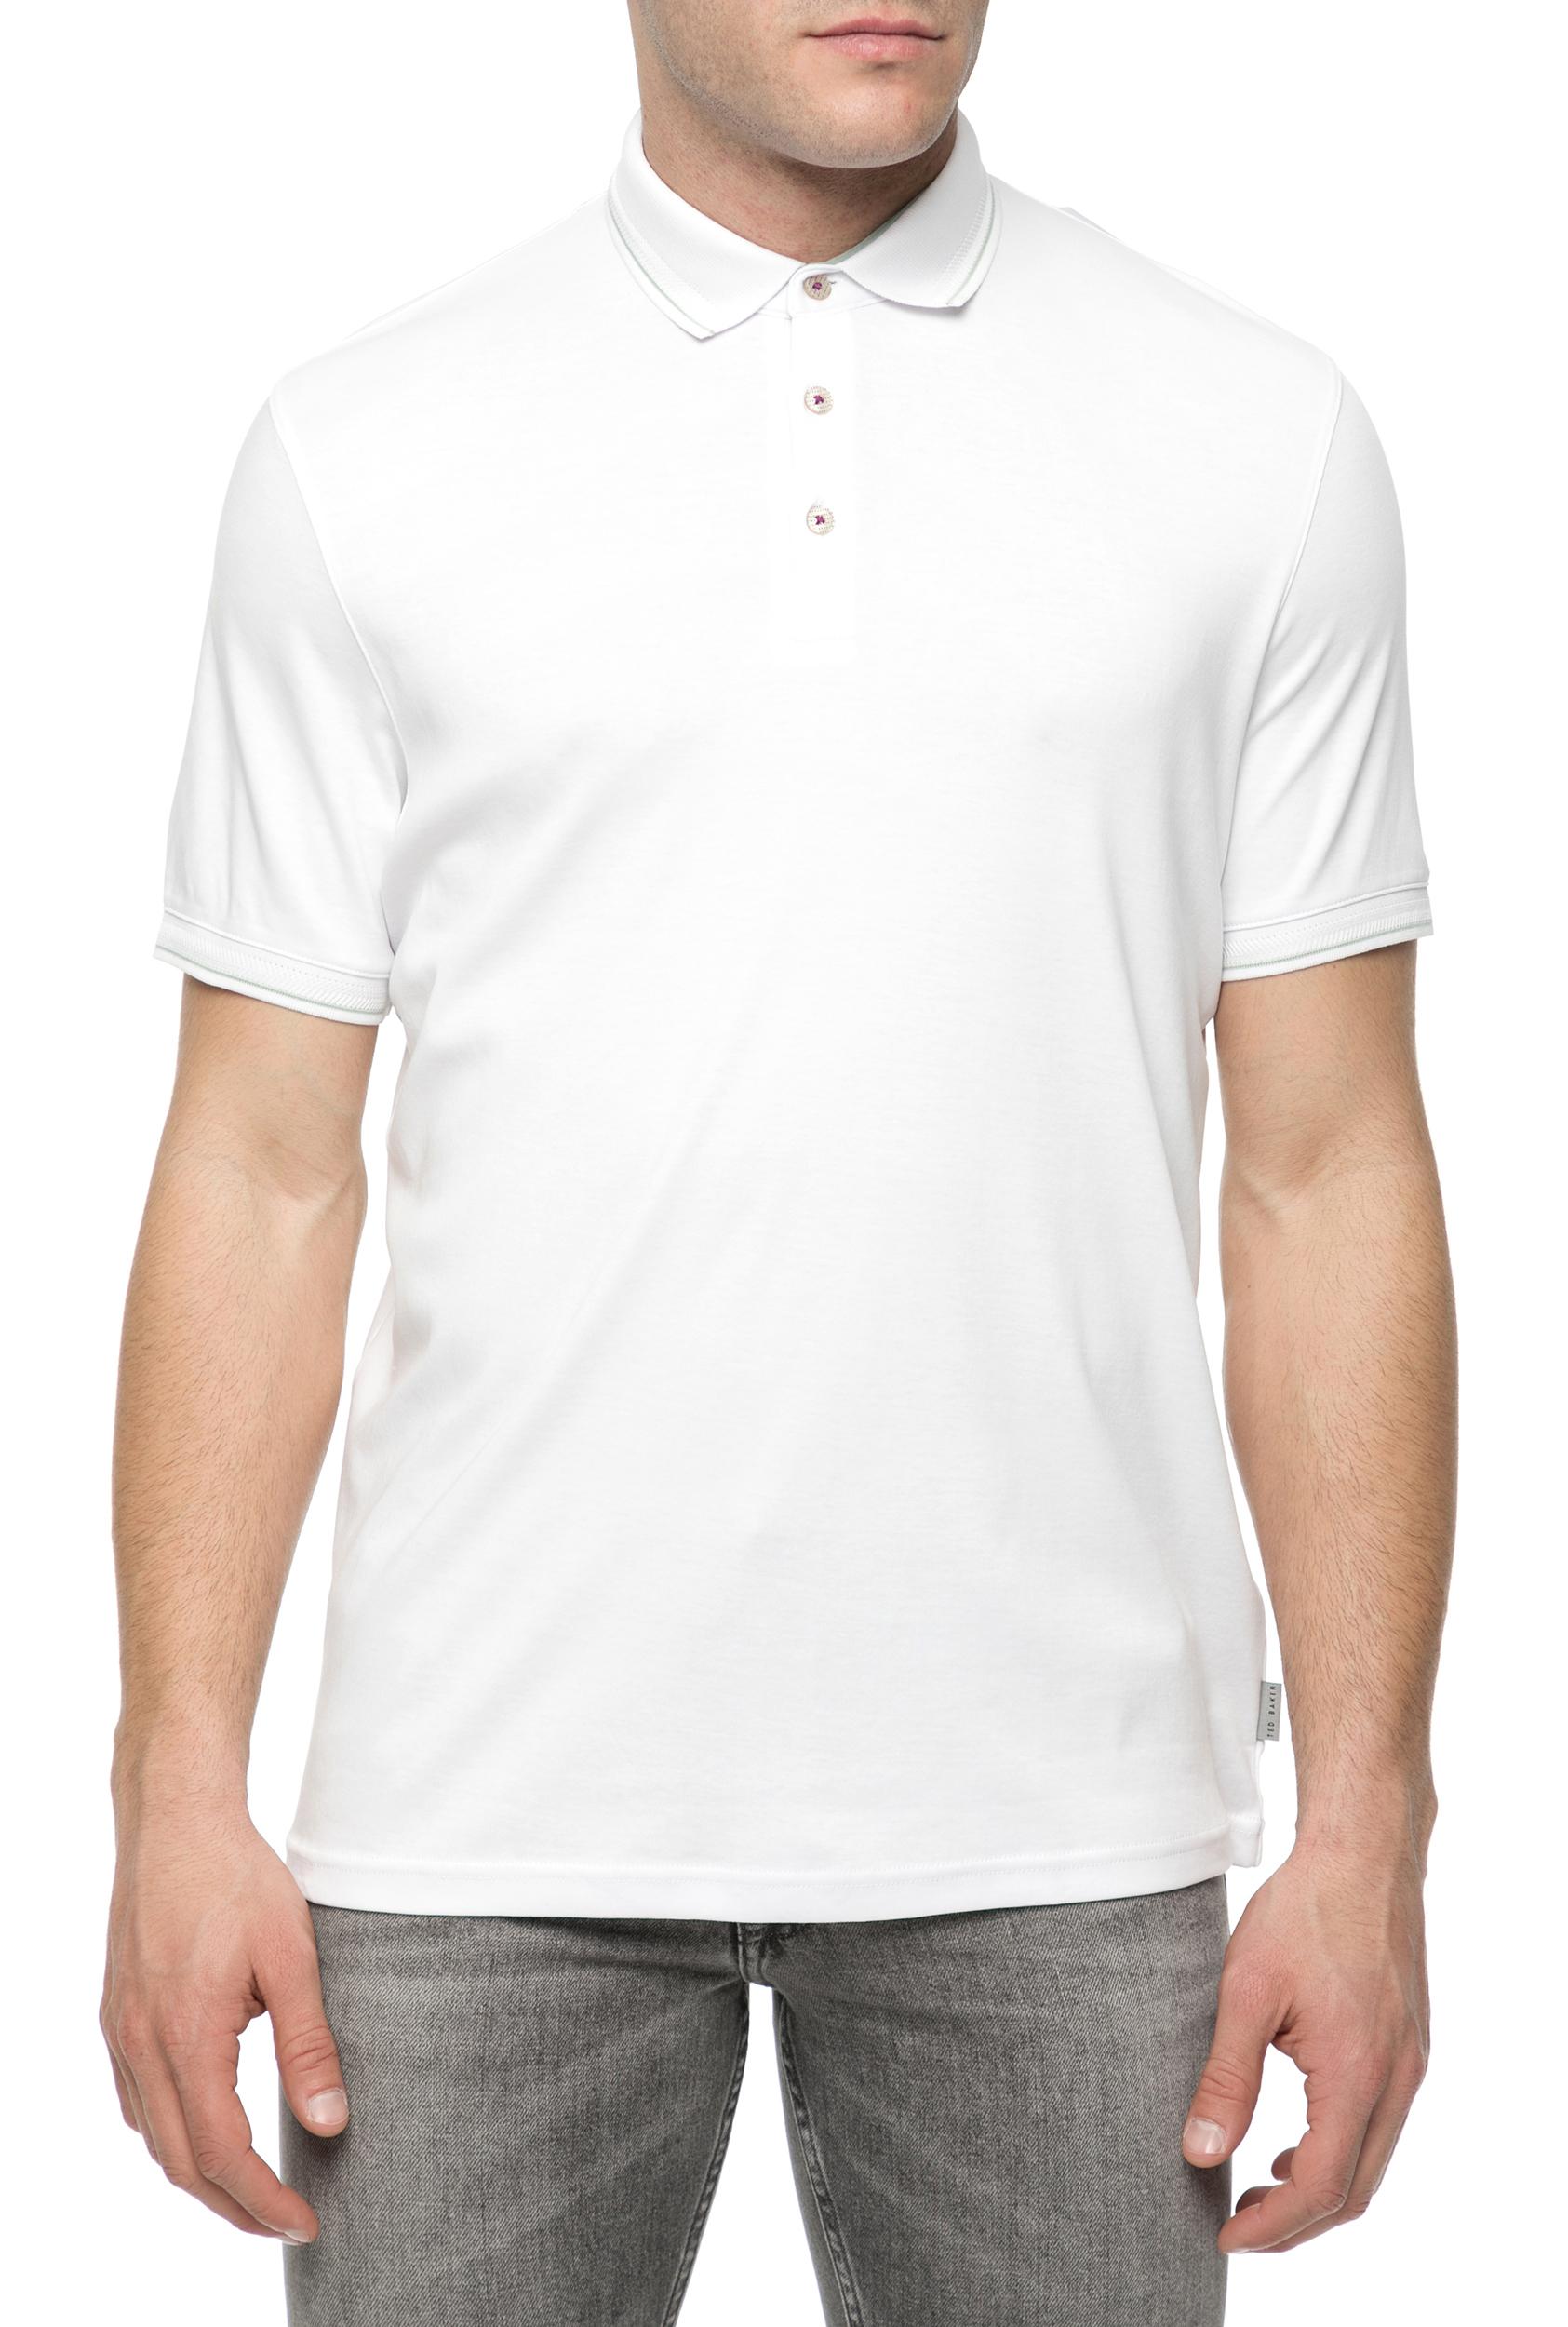 TED BAKER - Ανδρικό κοντομάνικο πόλο μπλουζάκι TED BAKER λευκό